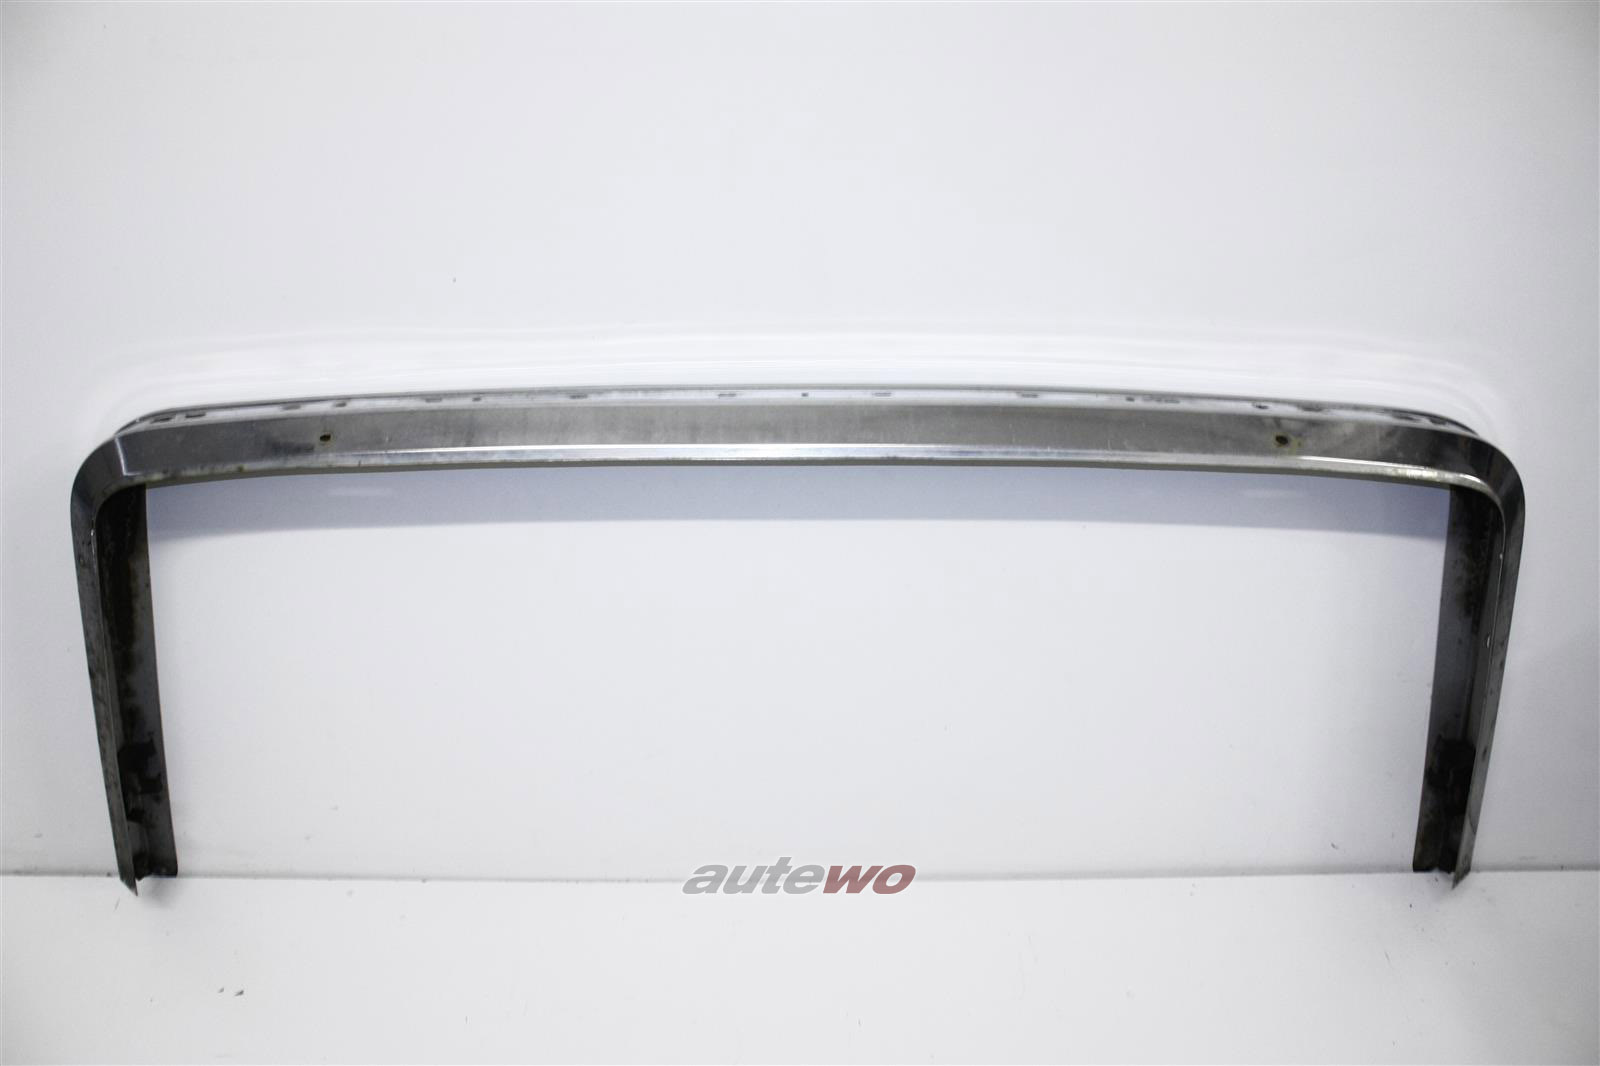 Audi 100 Typ 43 Limousine Stoßstange Hinten Chrom 431807303